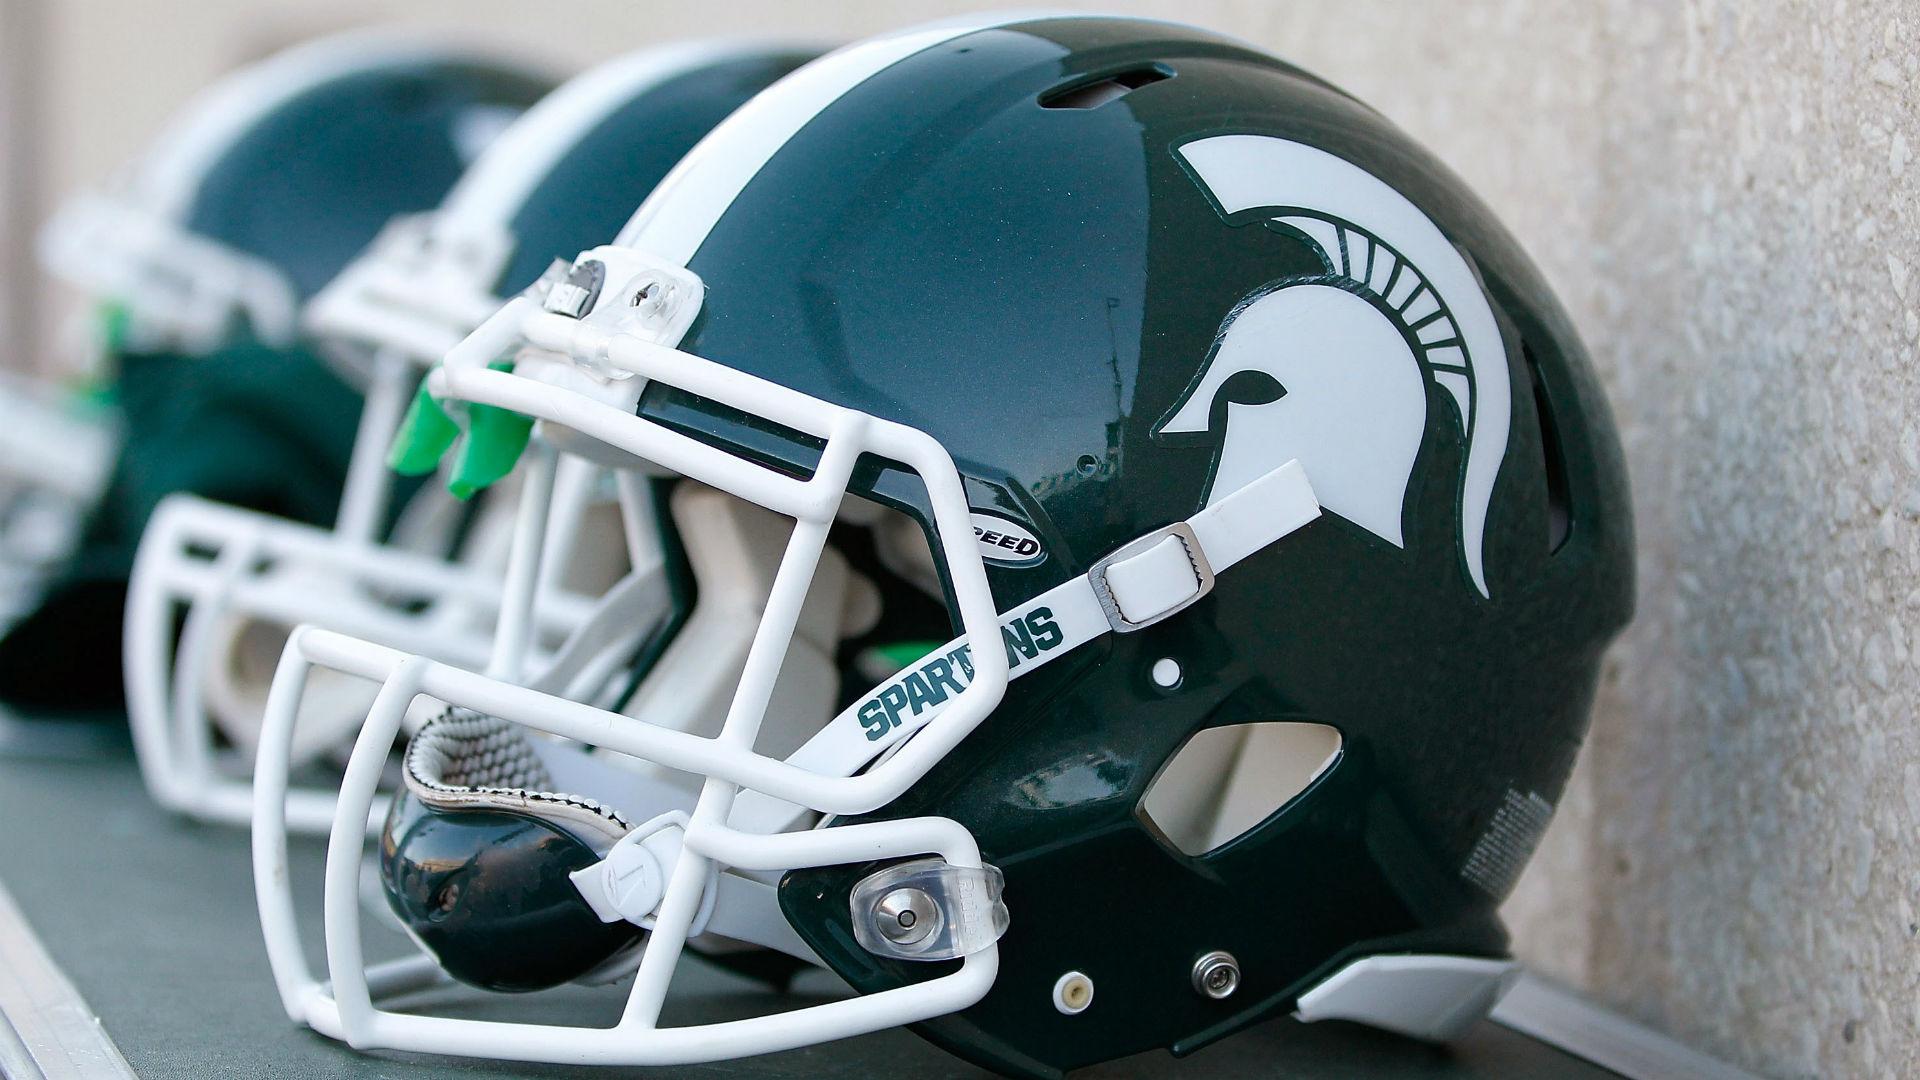 Michigan-state-helmet_oxtqatwwqdhv11hkma7sebvfr